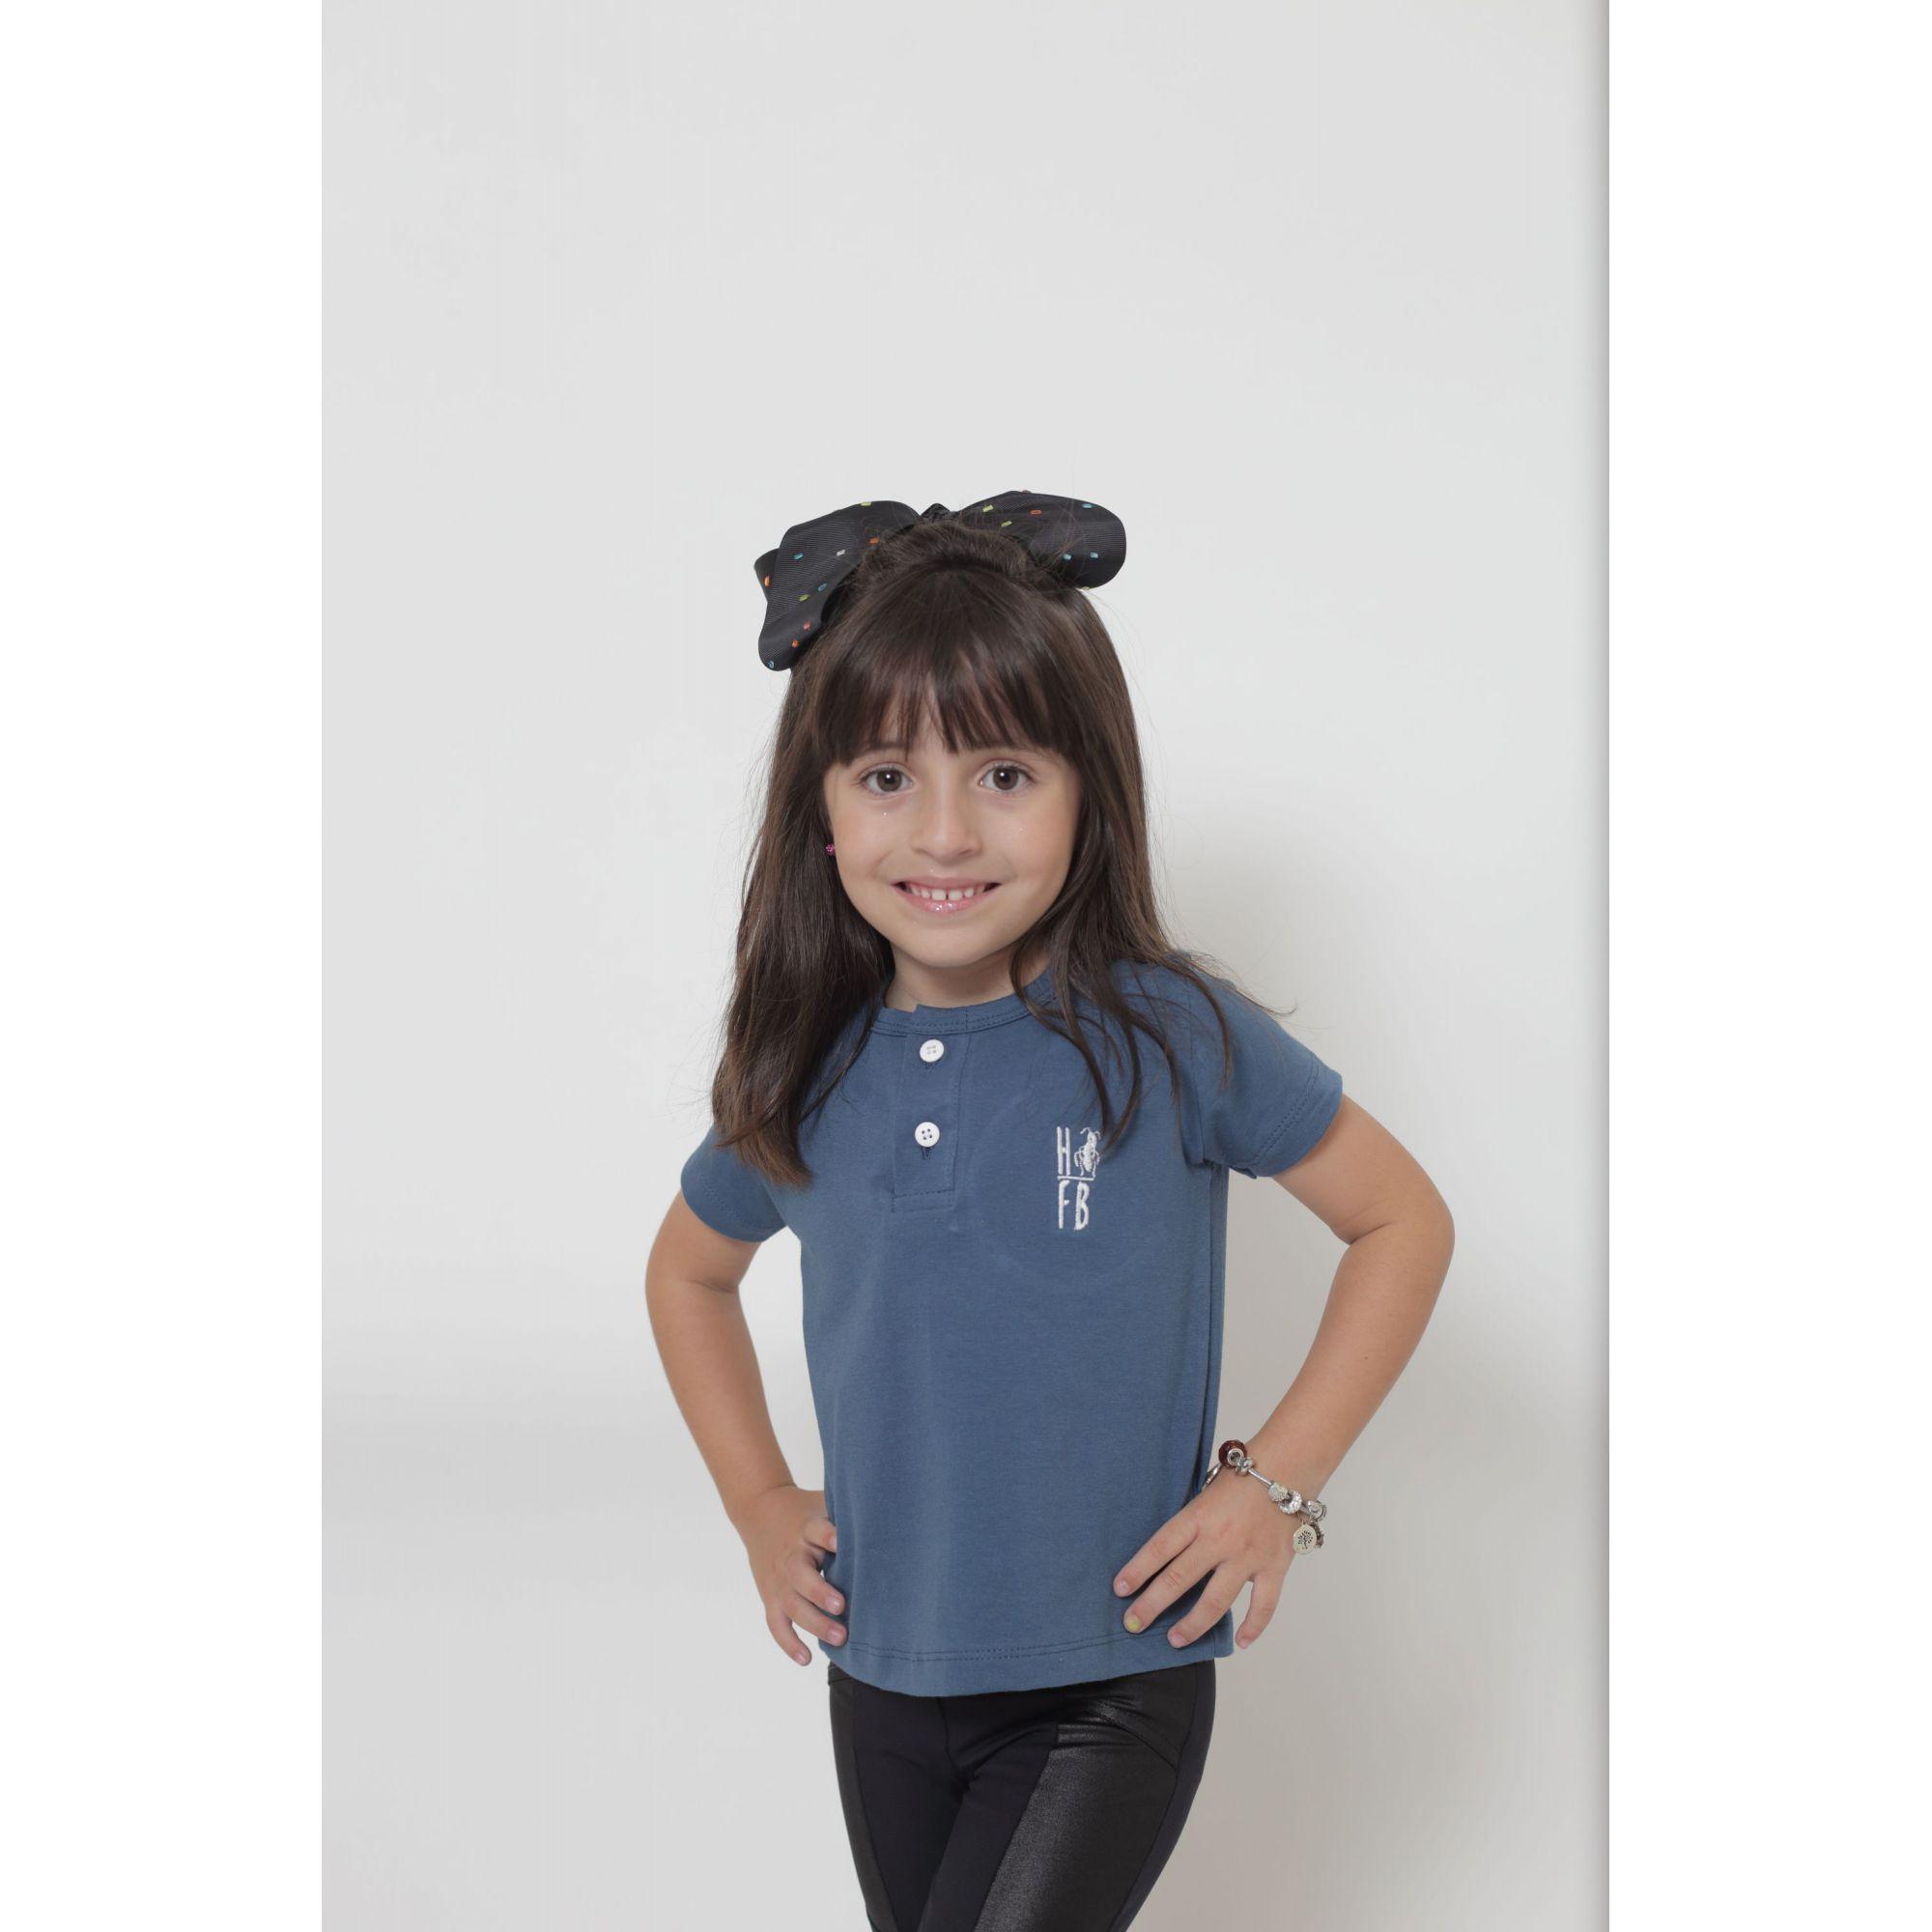 T-Shirt ou Body Unissex - Henley - Infantil - Azul Petróleo  - Heitor Fashion Brazil